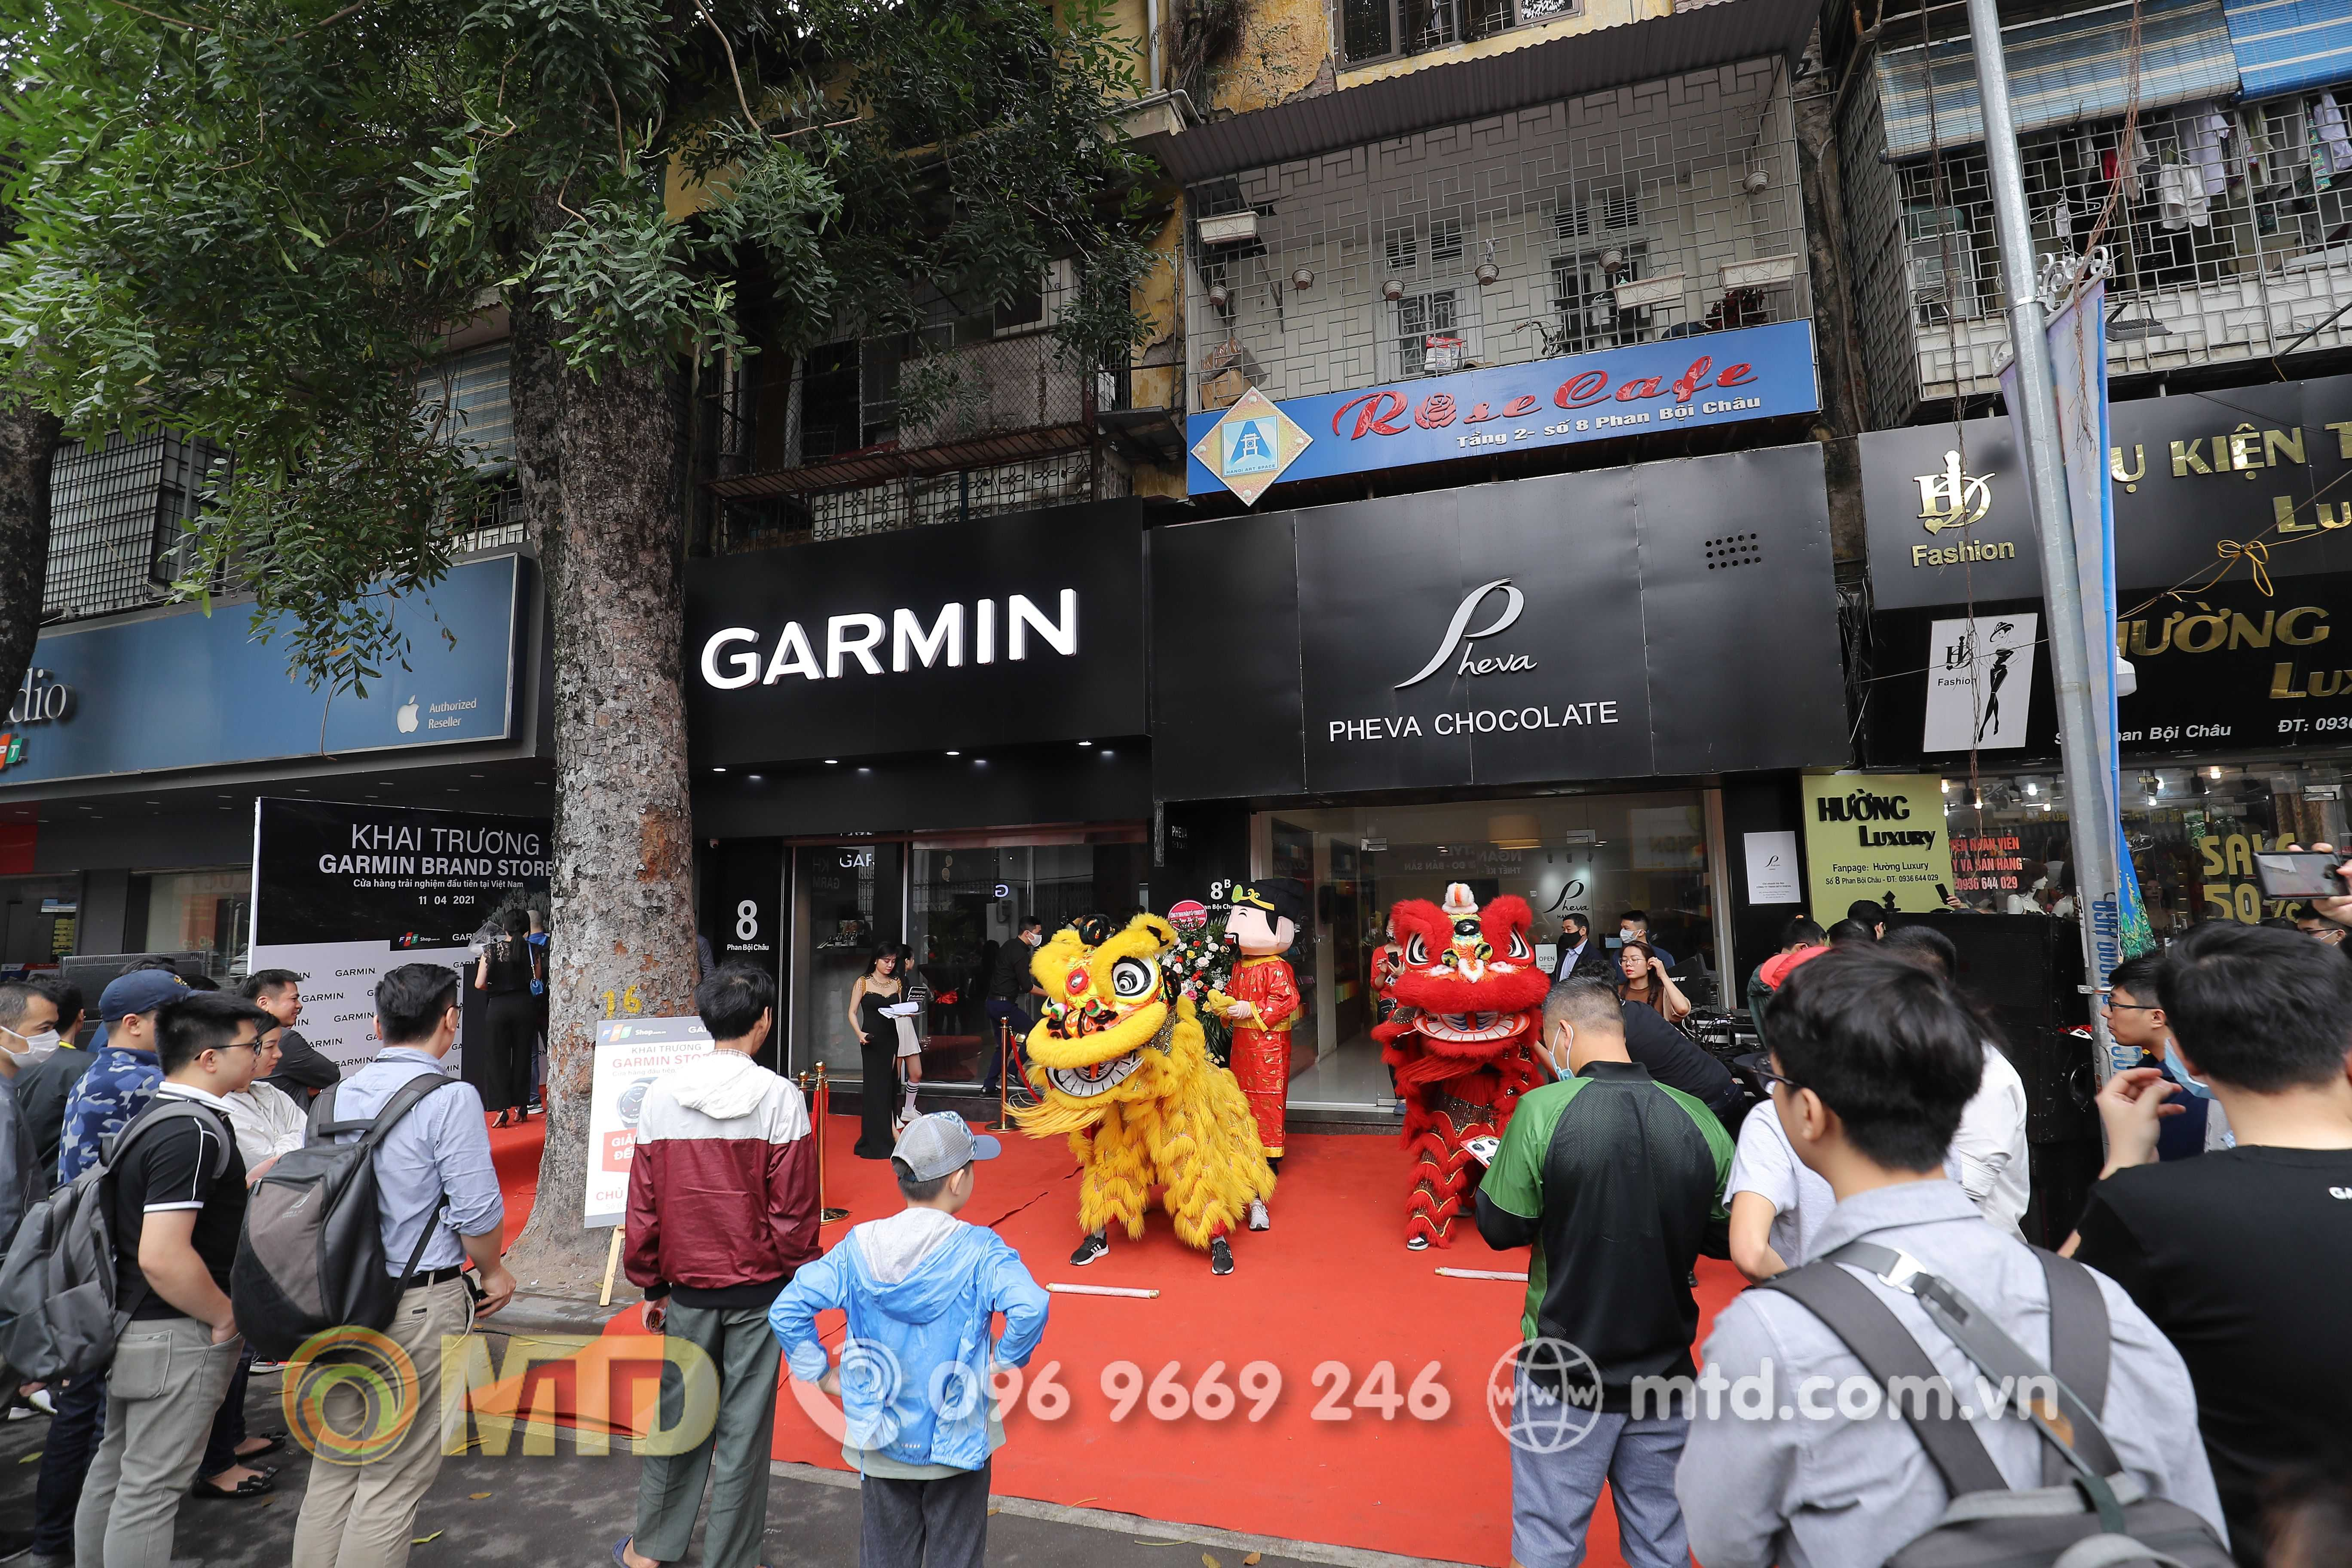 le-khai-truong-garmin-store